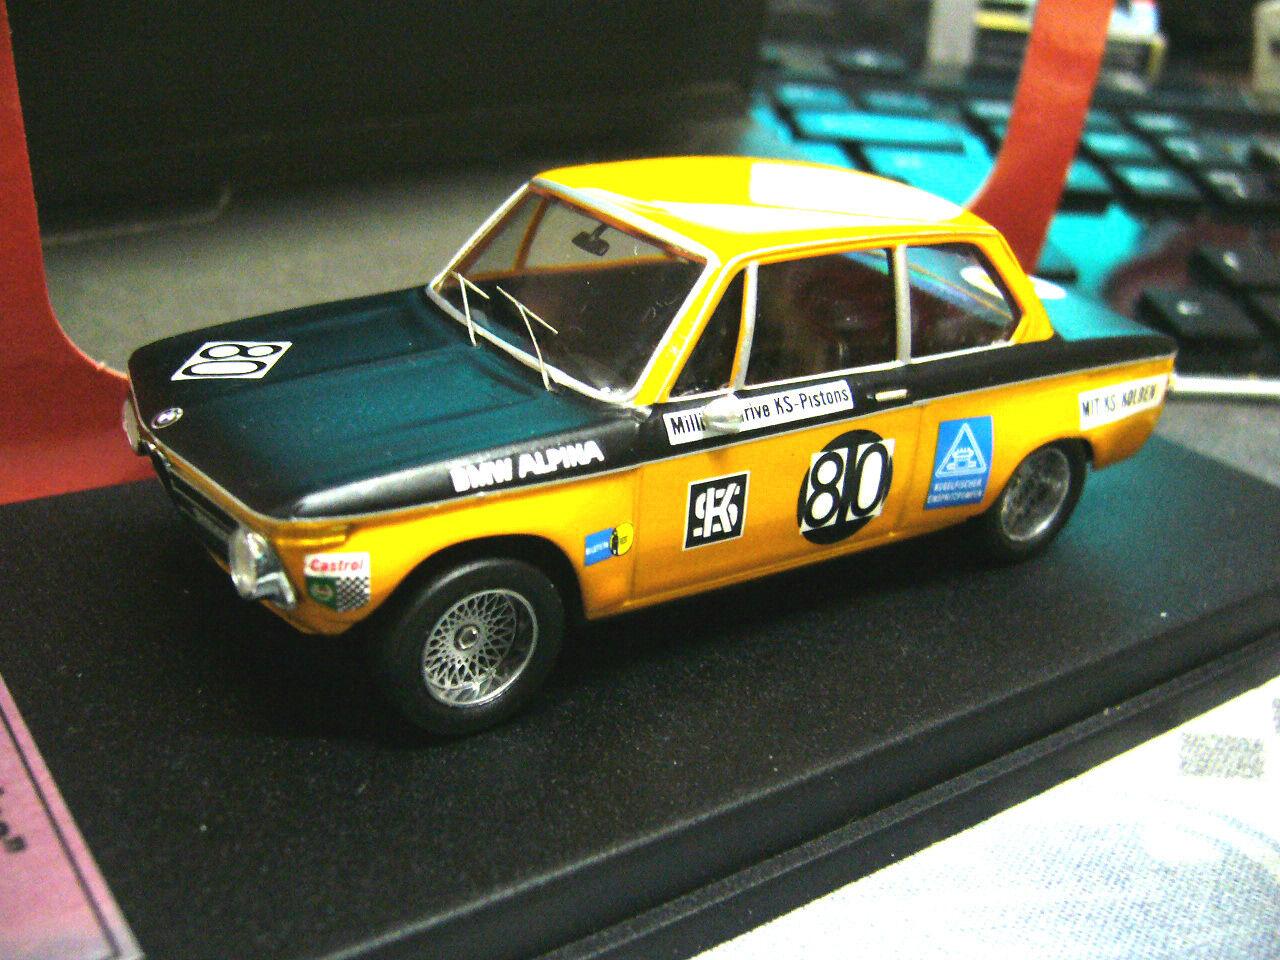 BMW 2002 1600 ti ALPINA Brno 1969  80 Huber treser rare 1 100 scala 43 1 43